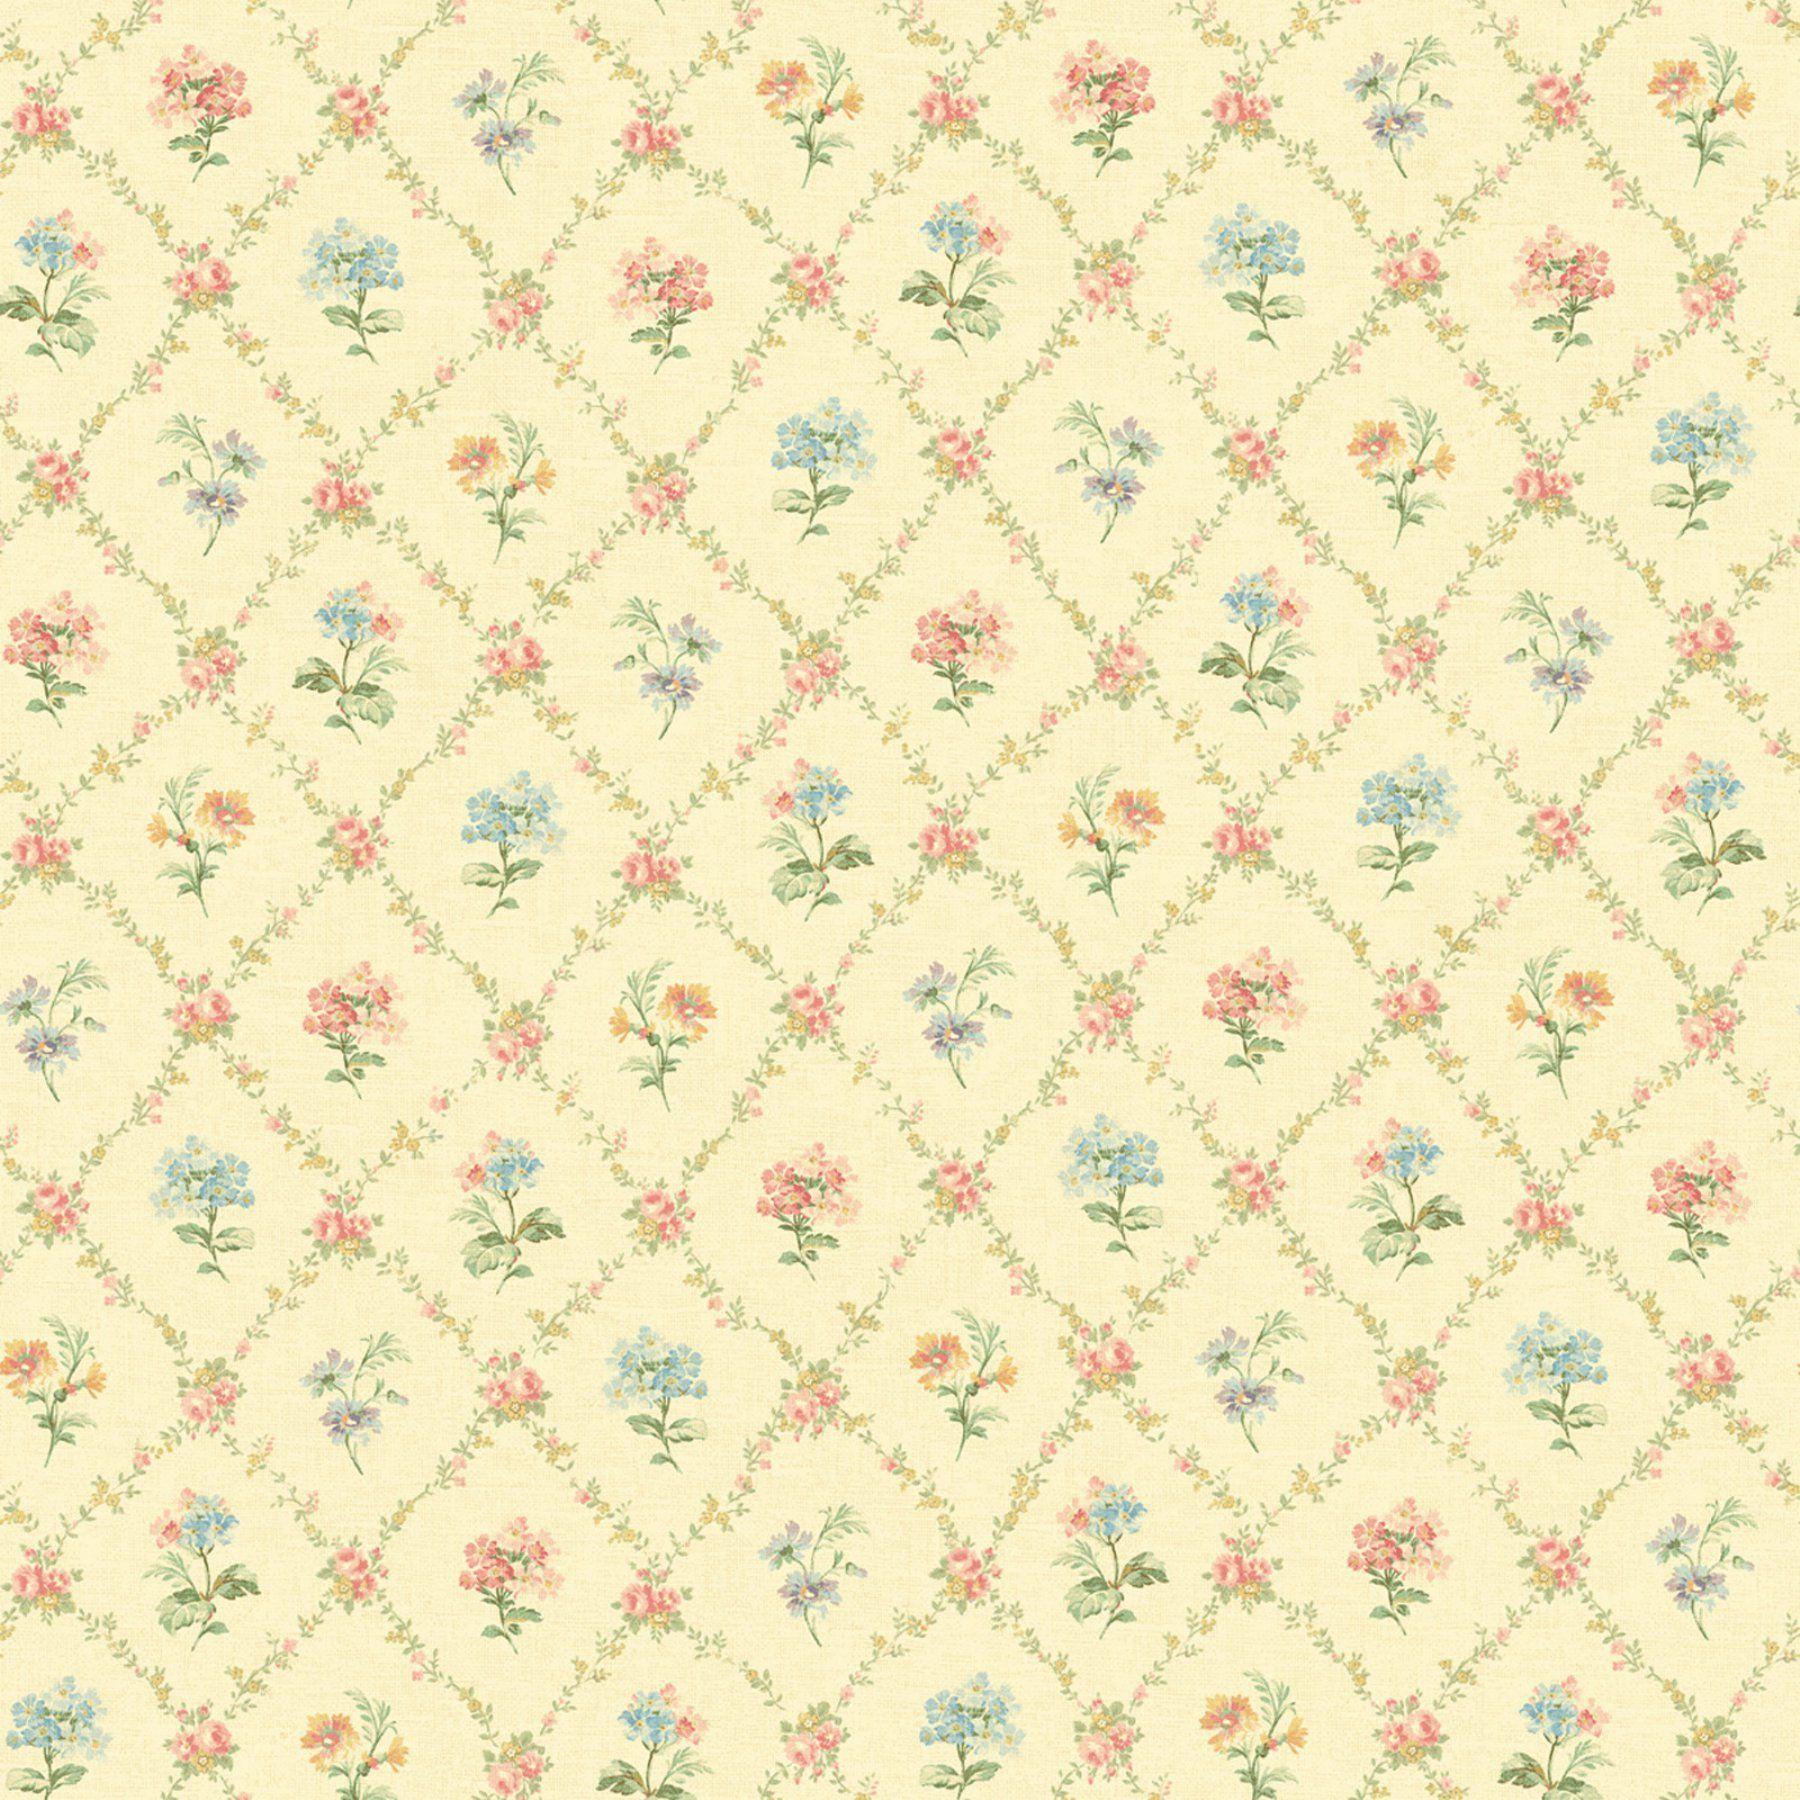 Fairwinds Studios Mini Floral Trellis Wallpaper - 522-30805